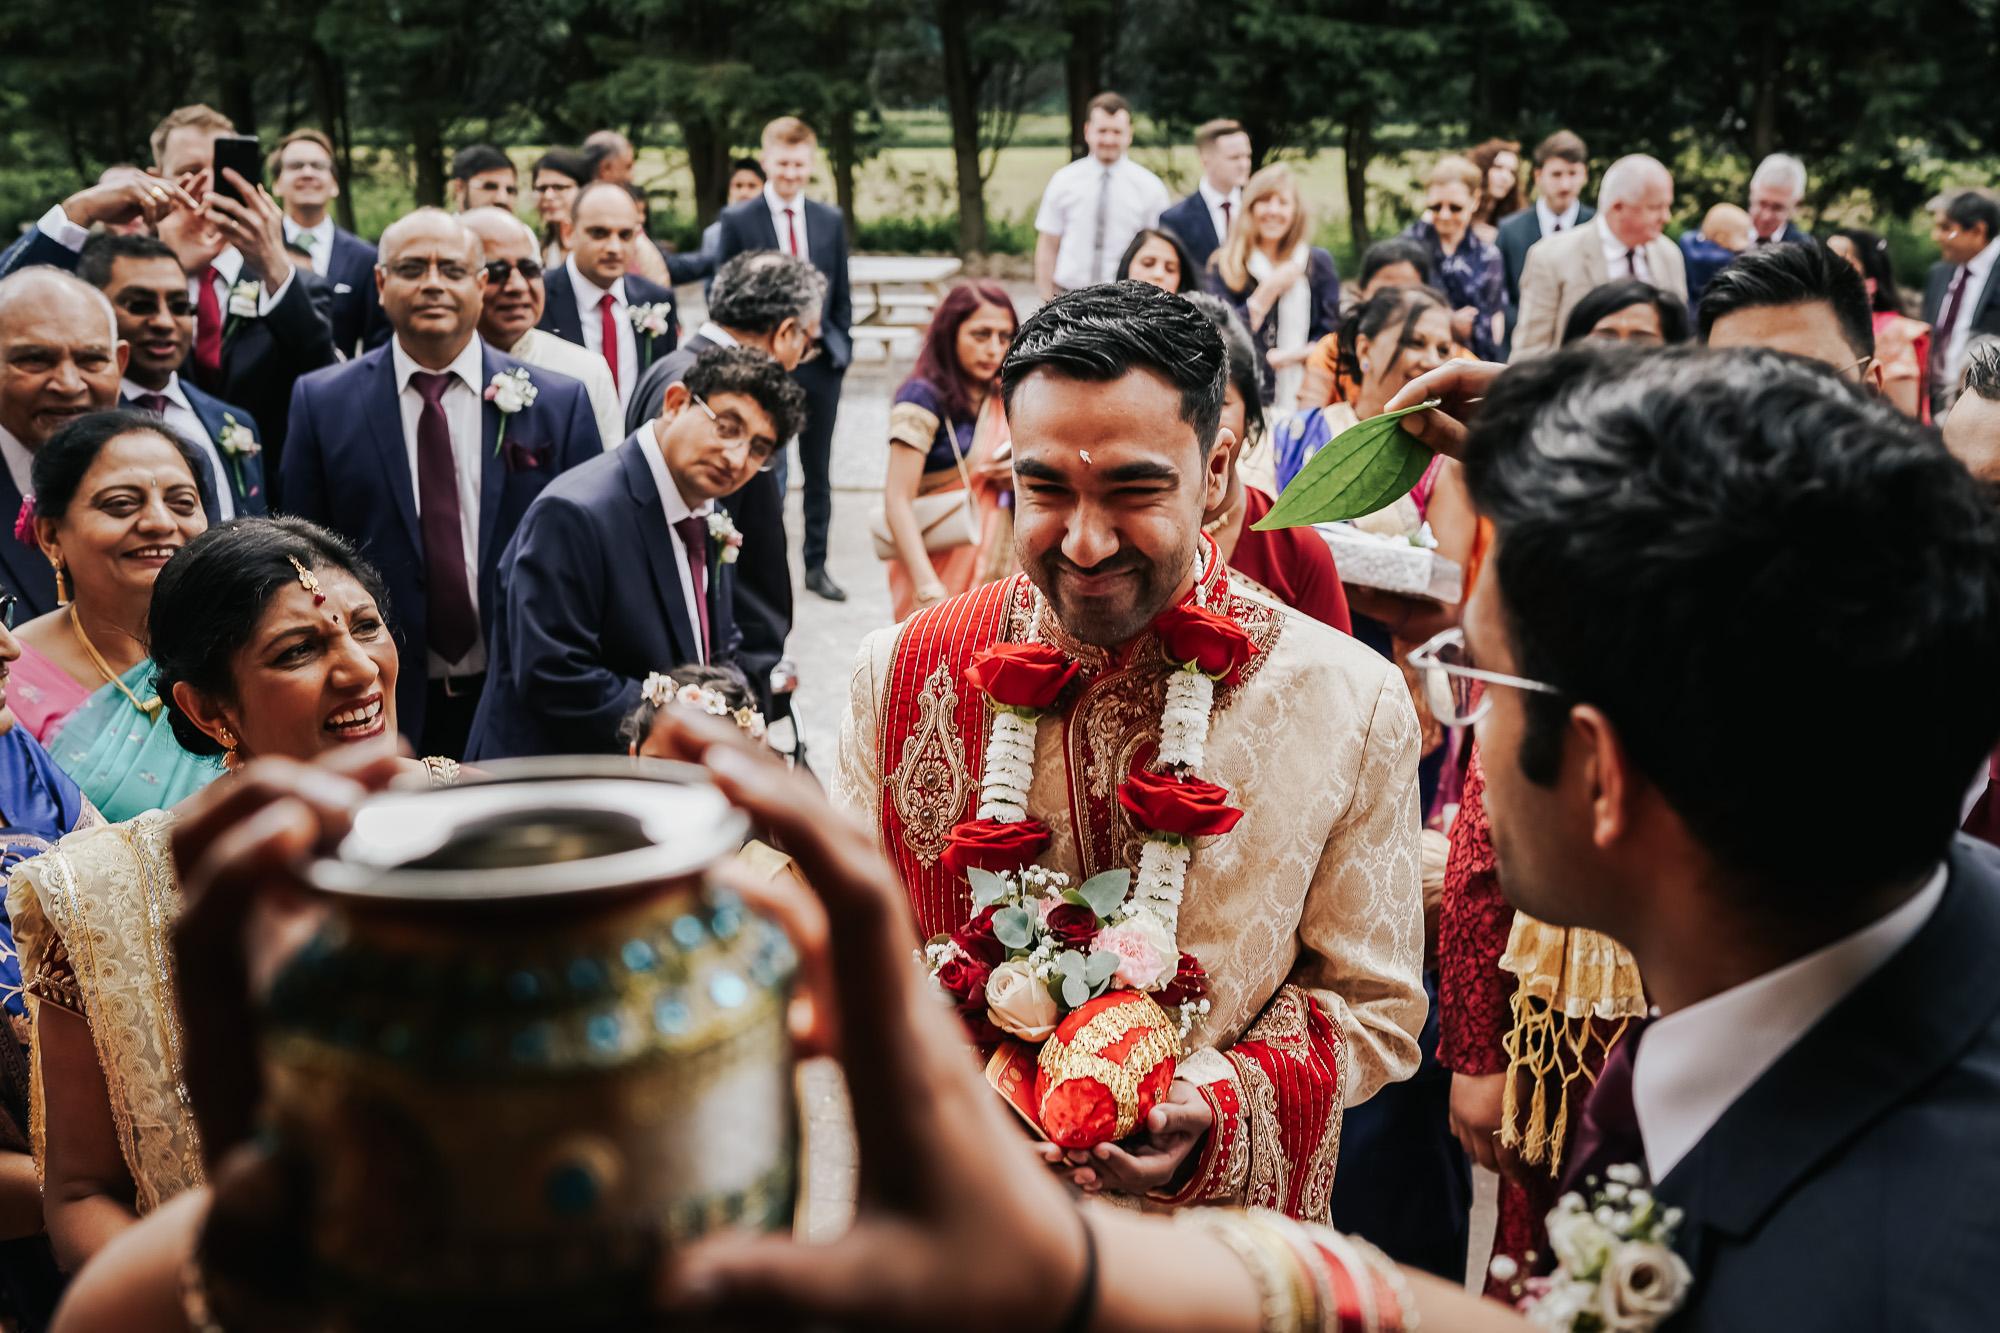 Alcumlow Hall Farm Indian Wedding Photographer (2 of 4).jpg